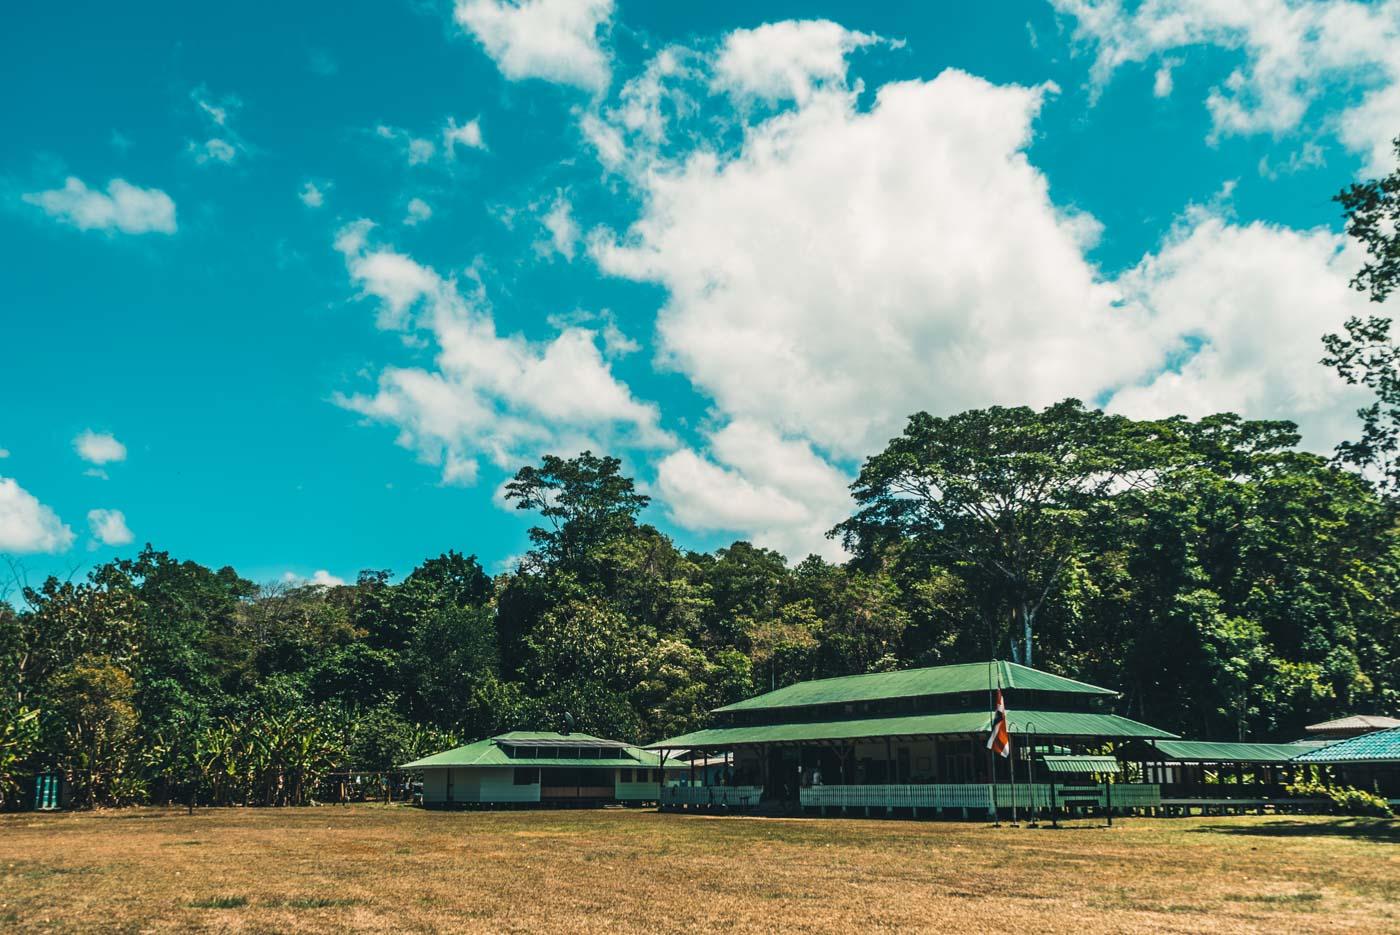 Visit Corcovado National Park: Sirena Range Station, Corcovado National Park